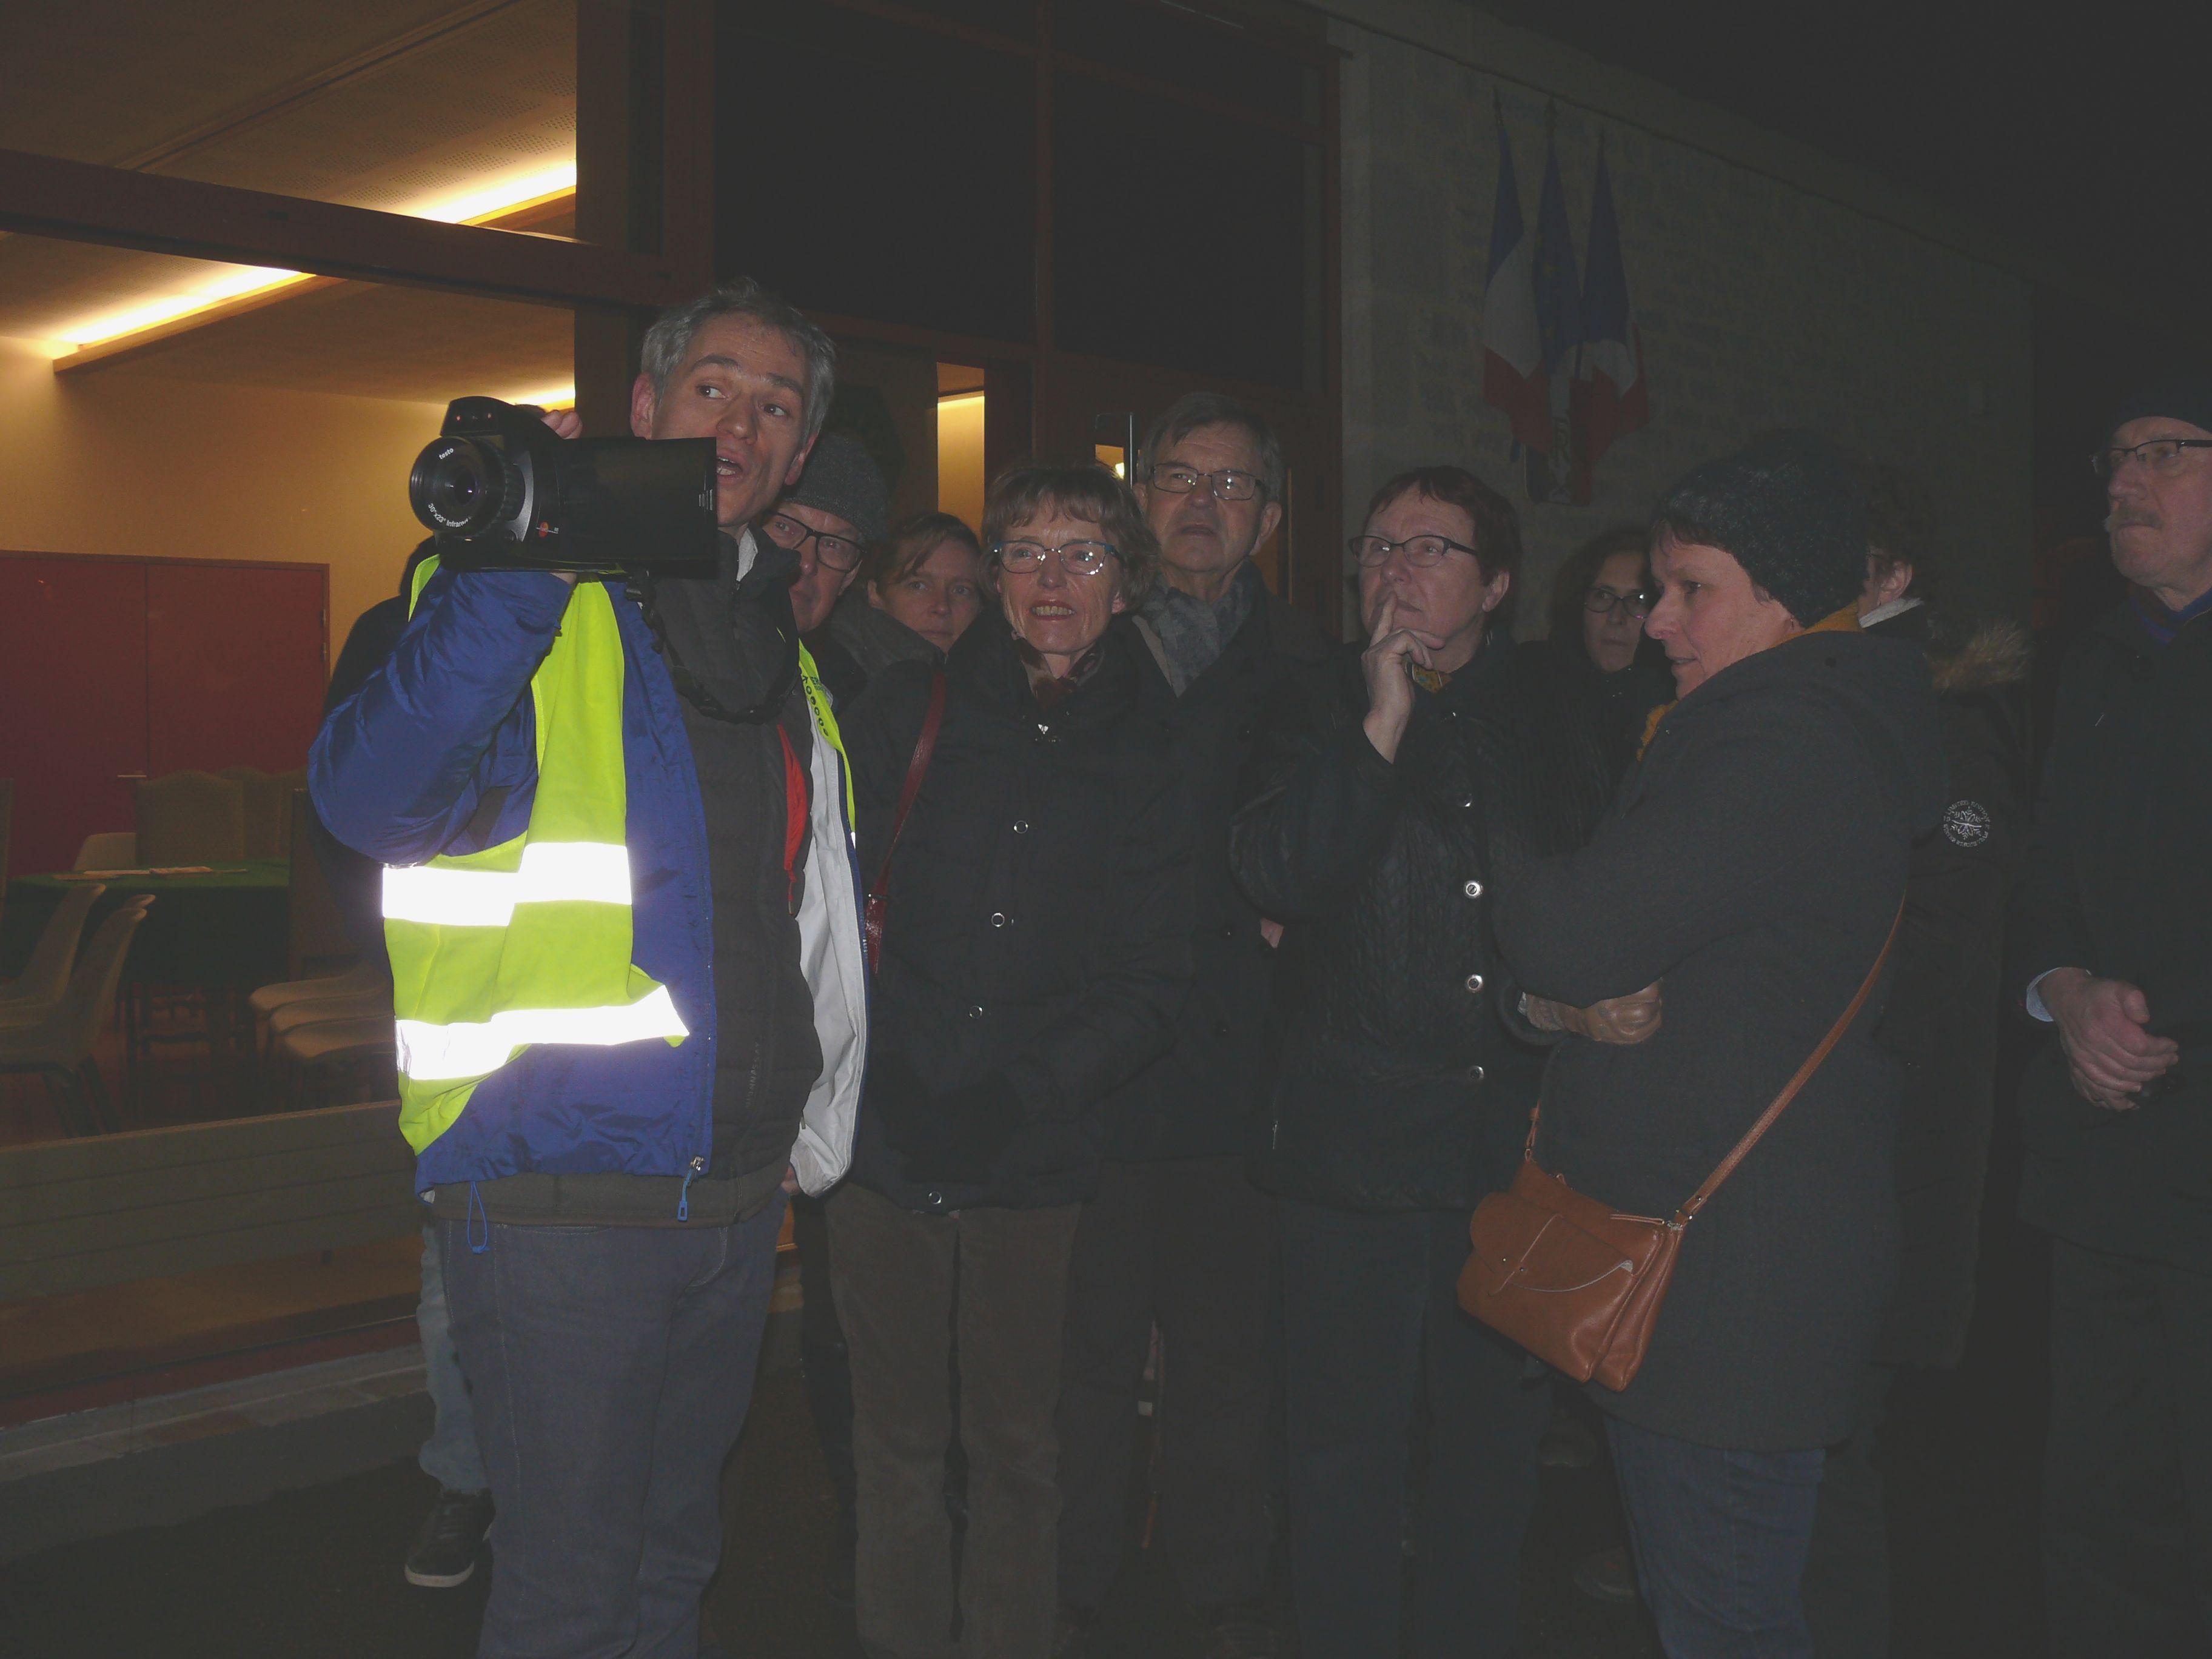 2018-02-06-Balade thermique-Chorey les Beaune-CABCS-P1260507